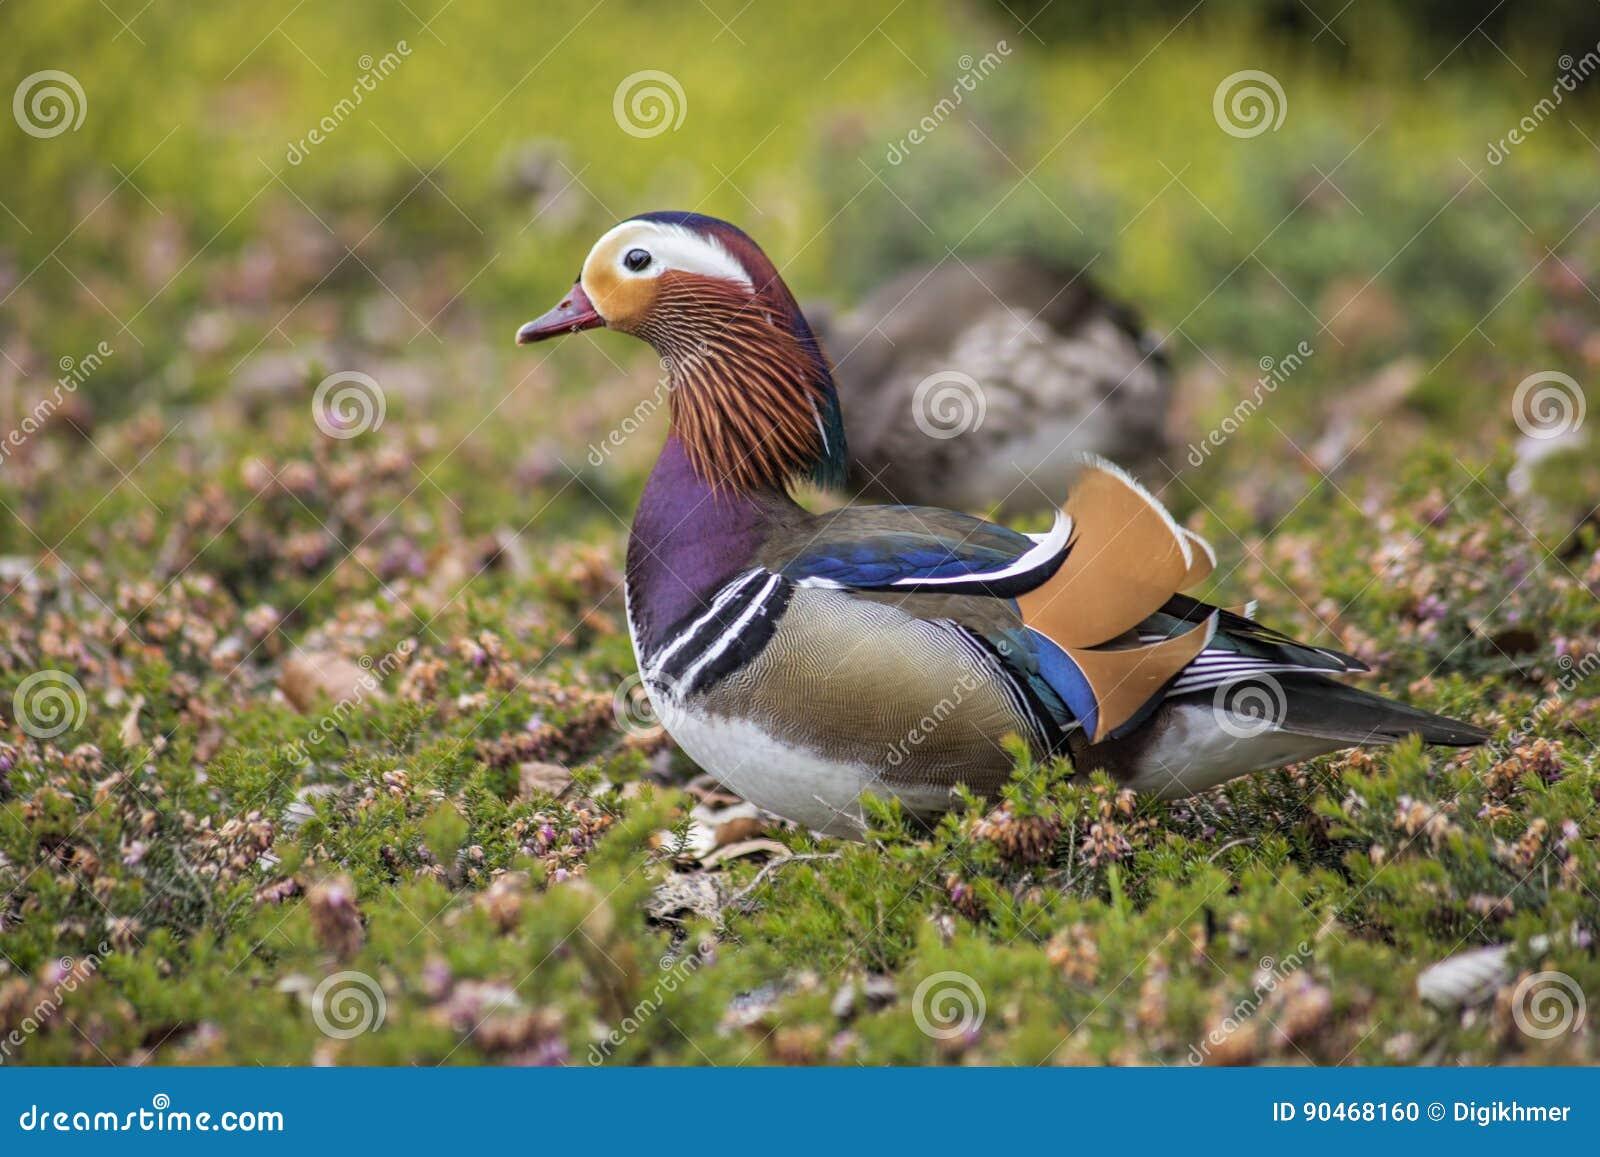 Pares del pato de mandarín